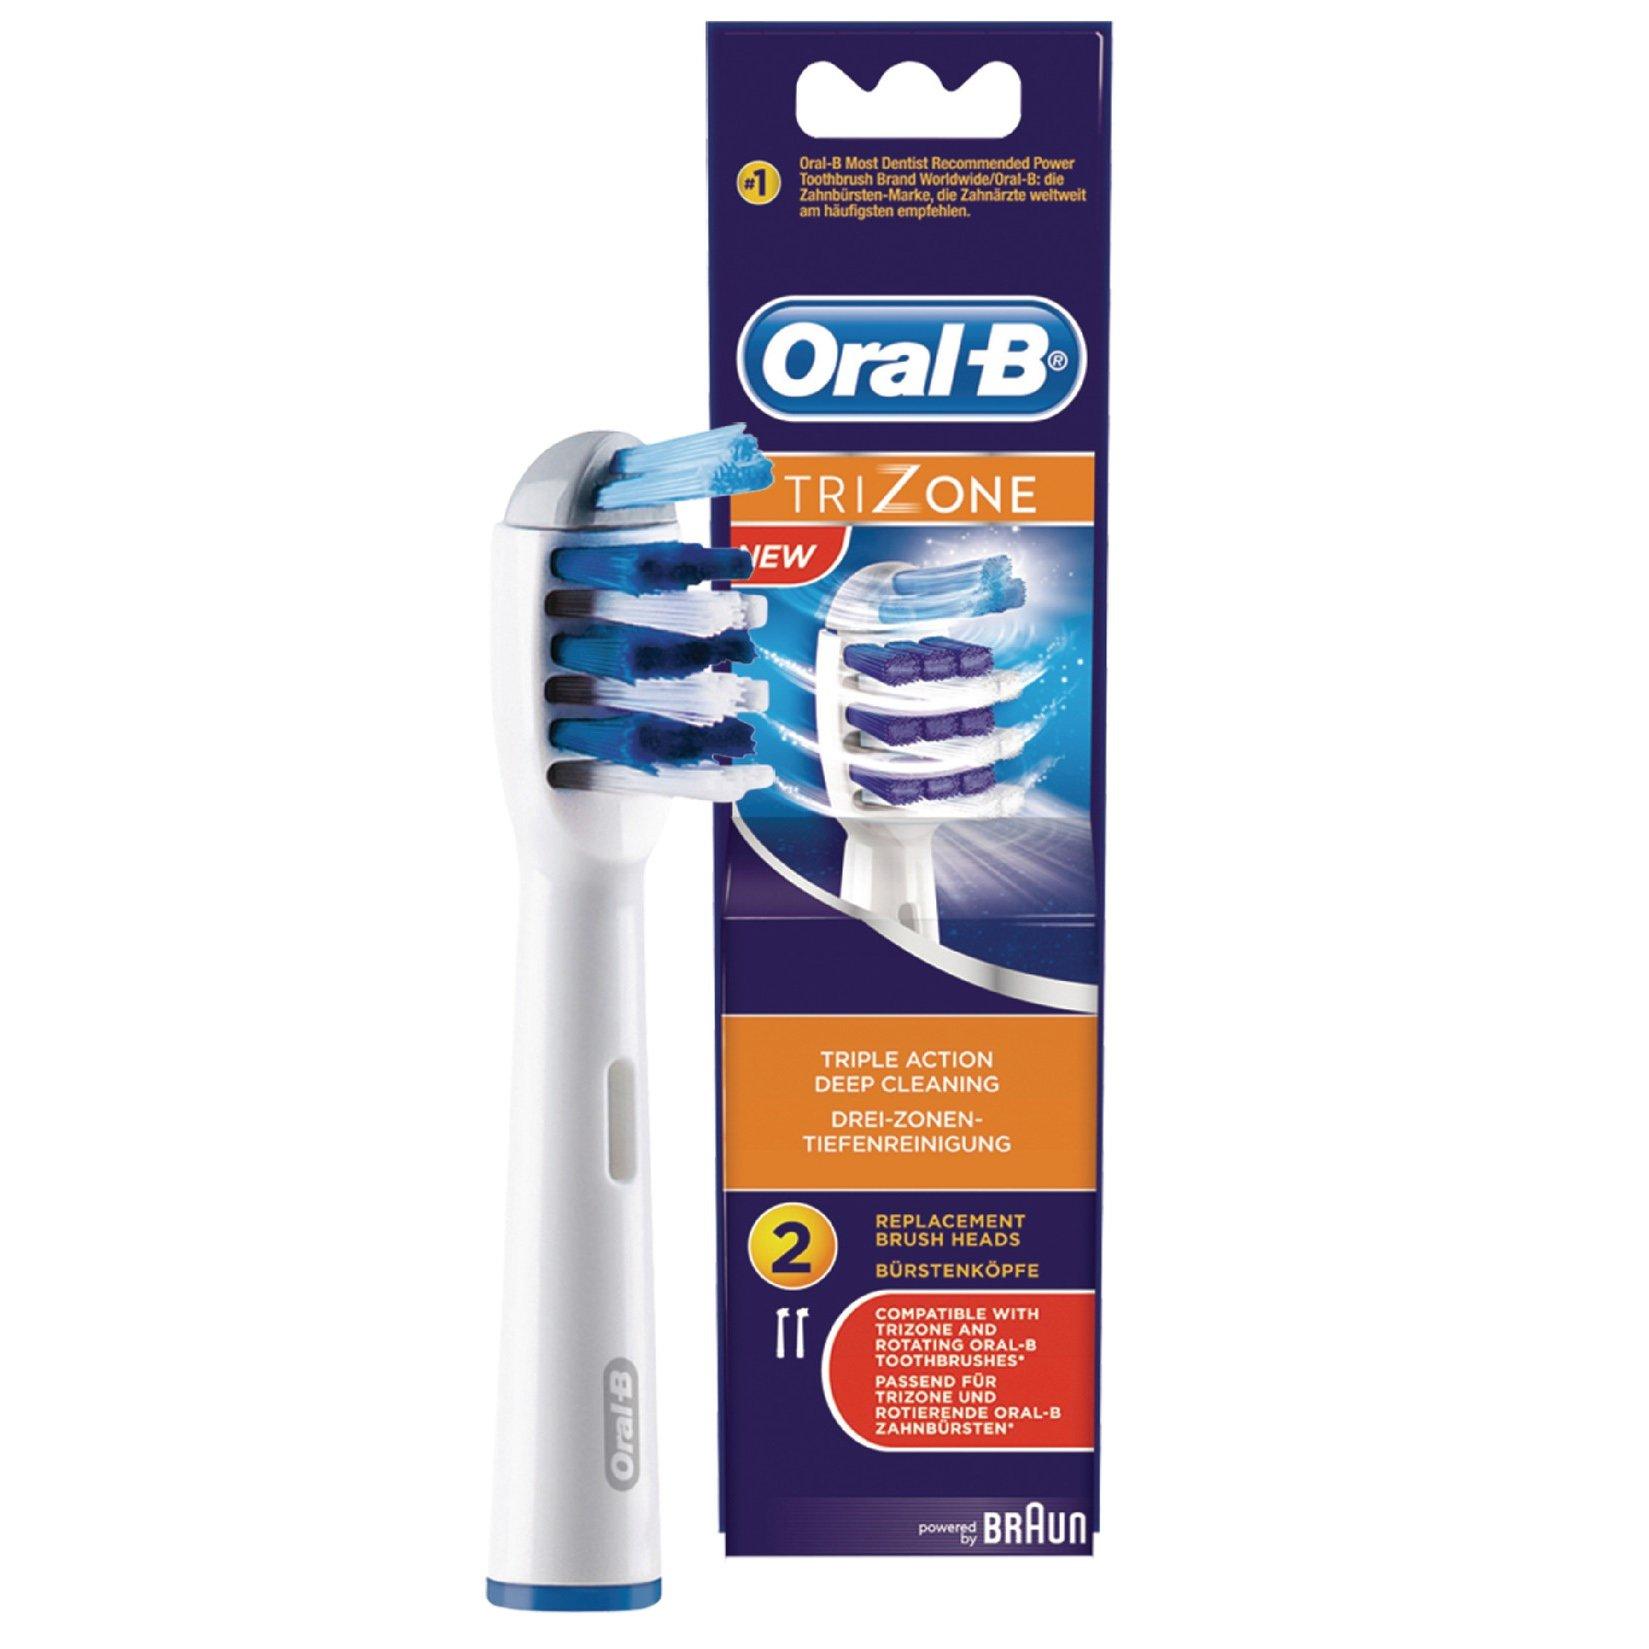 Oral-B TriZone Ανταλλακτικές Κεφαλές Ηλεκτρικής Οδοντόβουρτσας 2 Τεμάχια